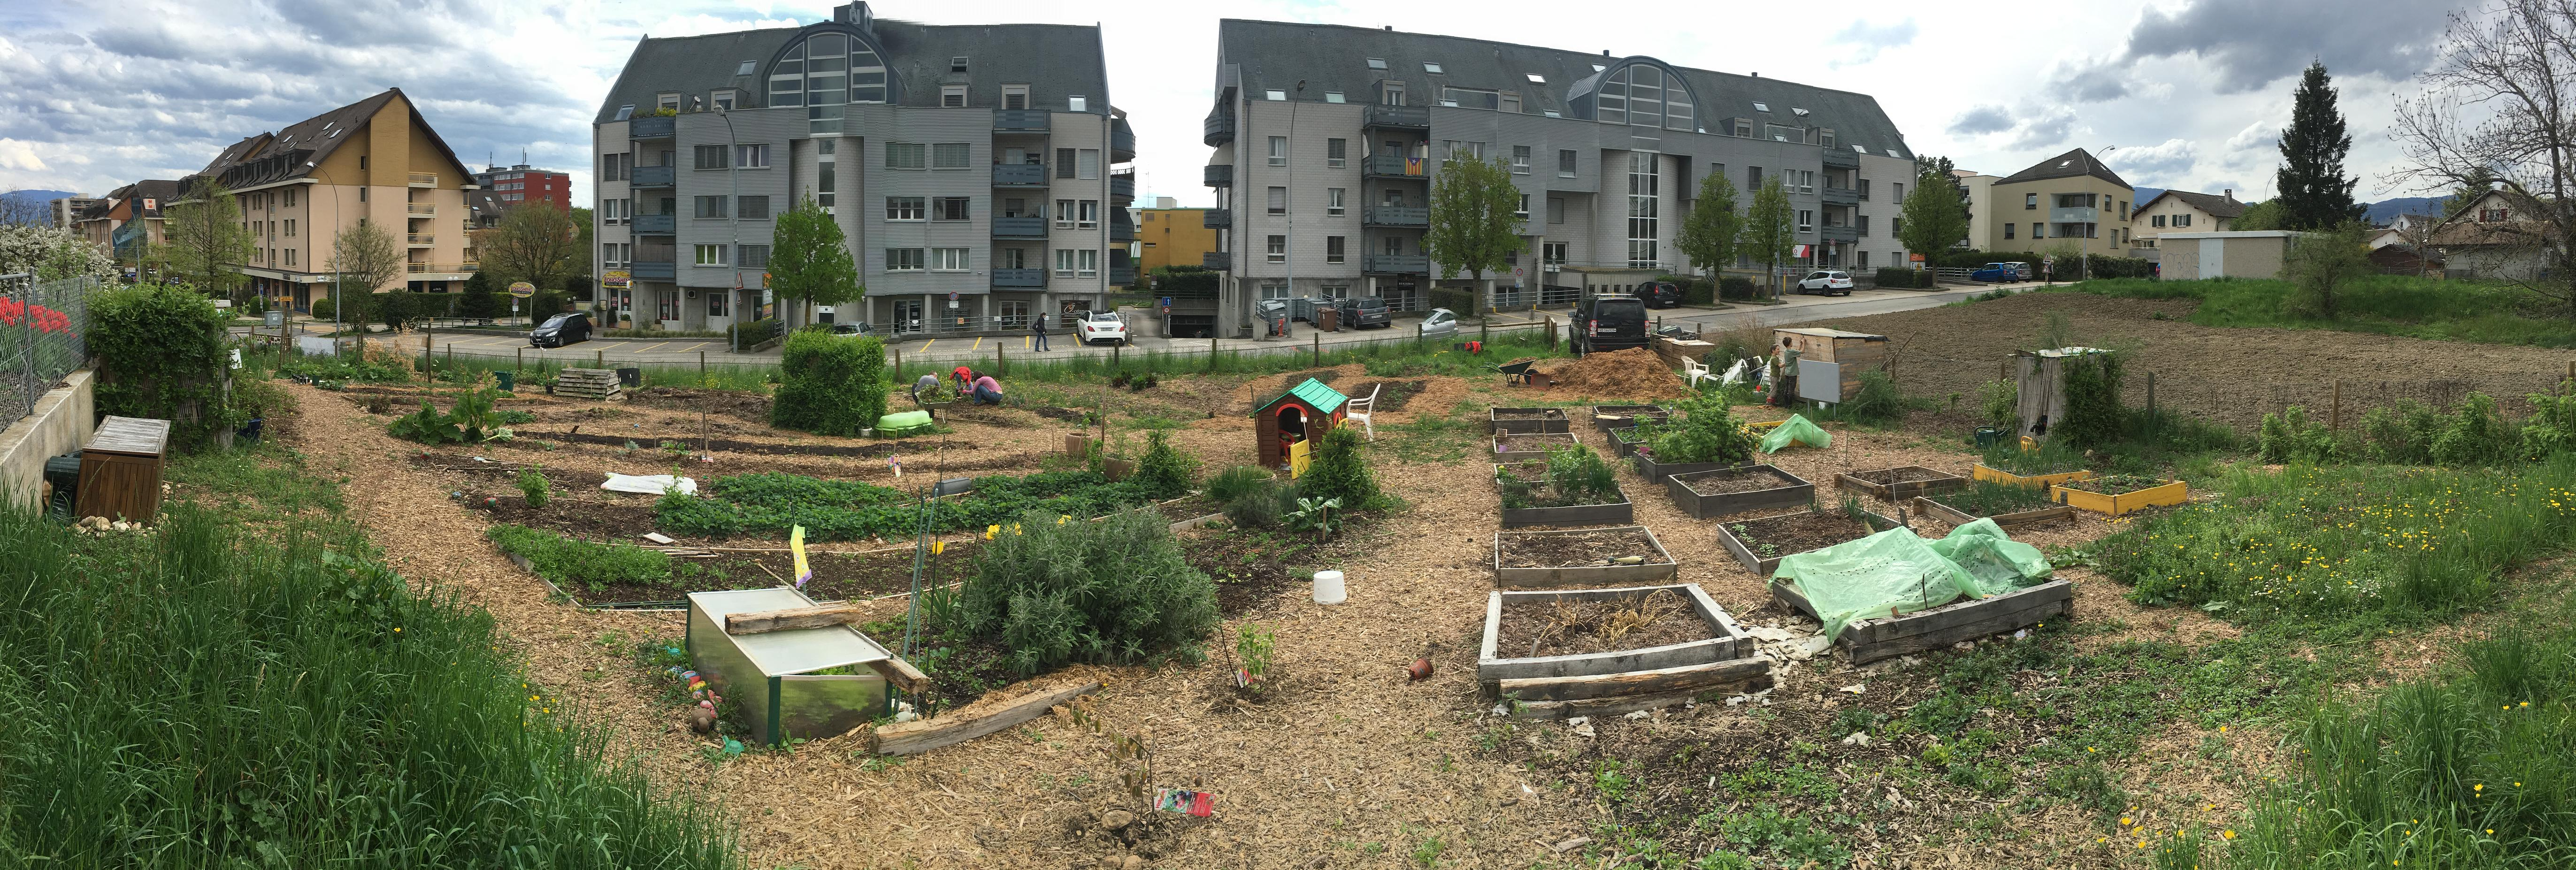 how to start a community garden - How To Start A Community Garden